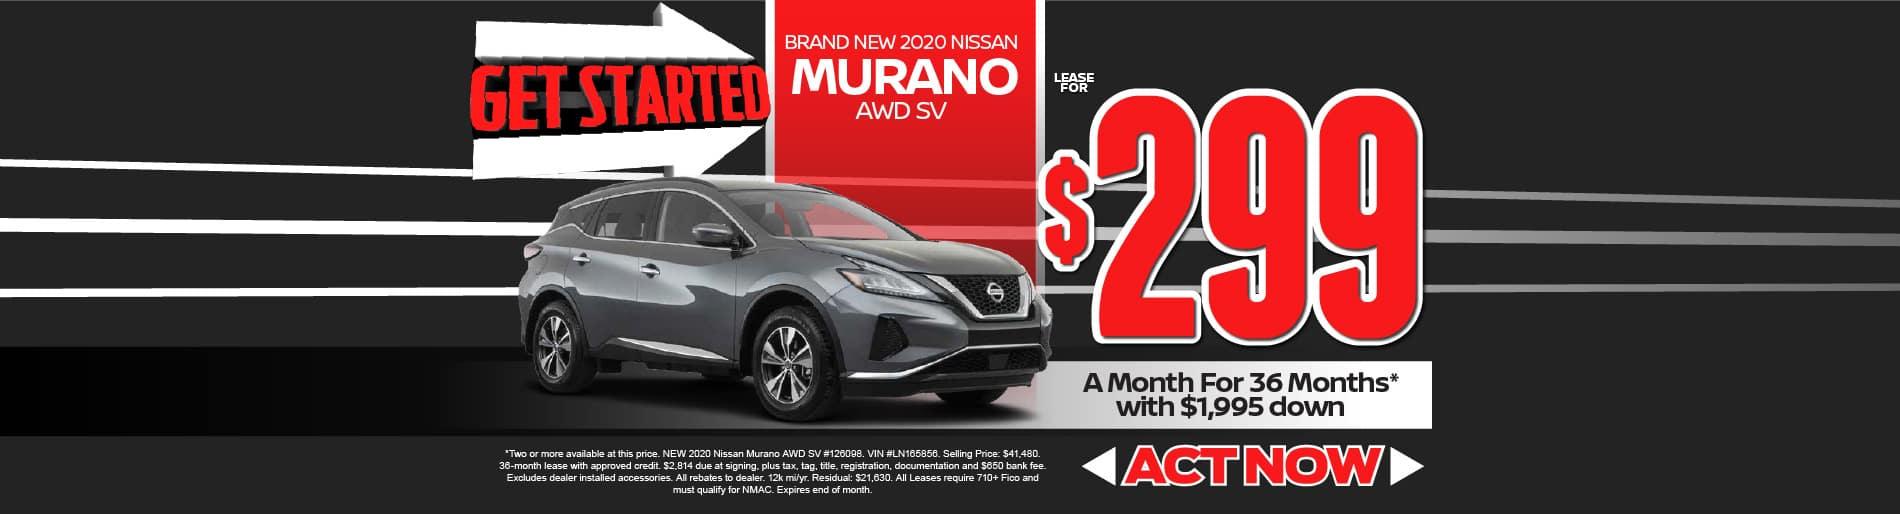 2020 Nissan Murano $299/mo - view inventory